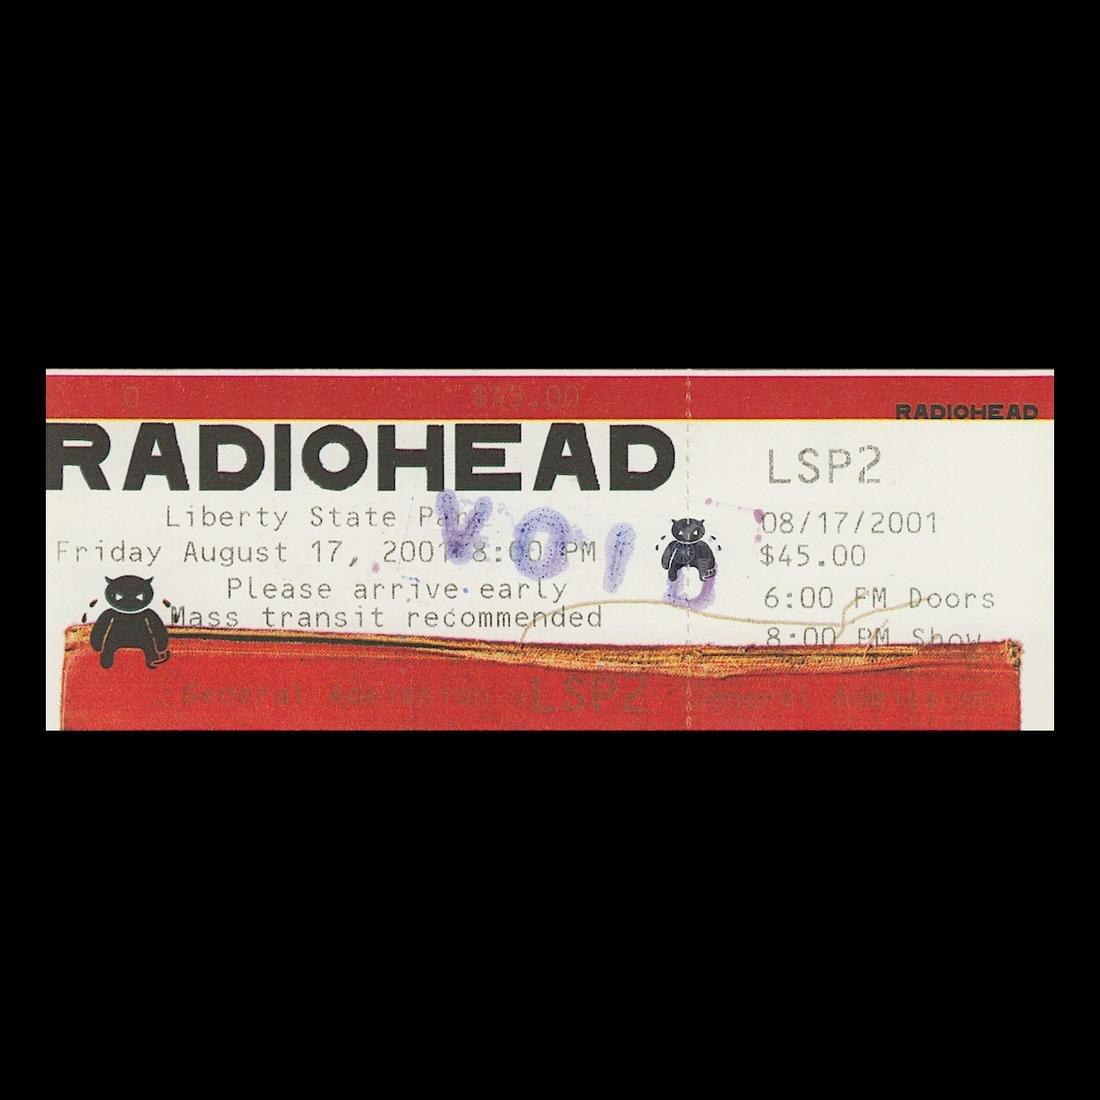 Radiohead - 2001 Vintage Concert Ticket